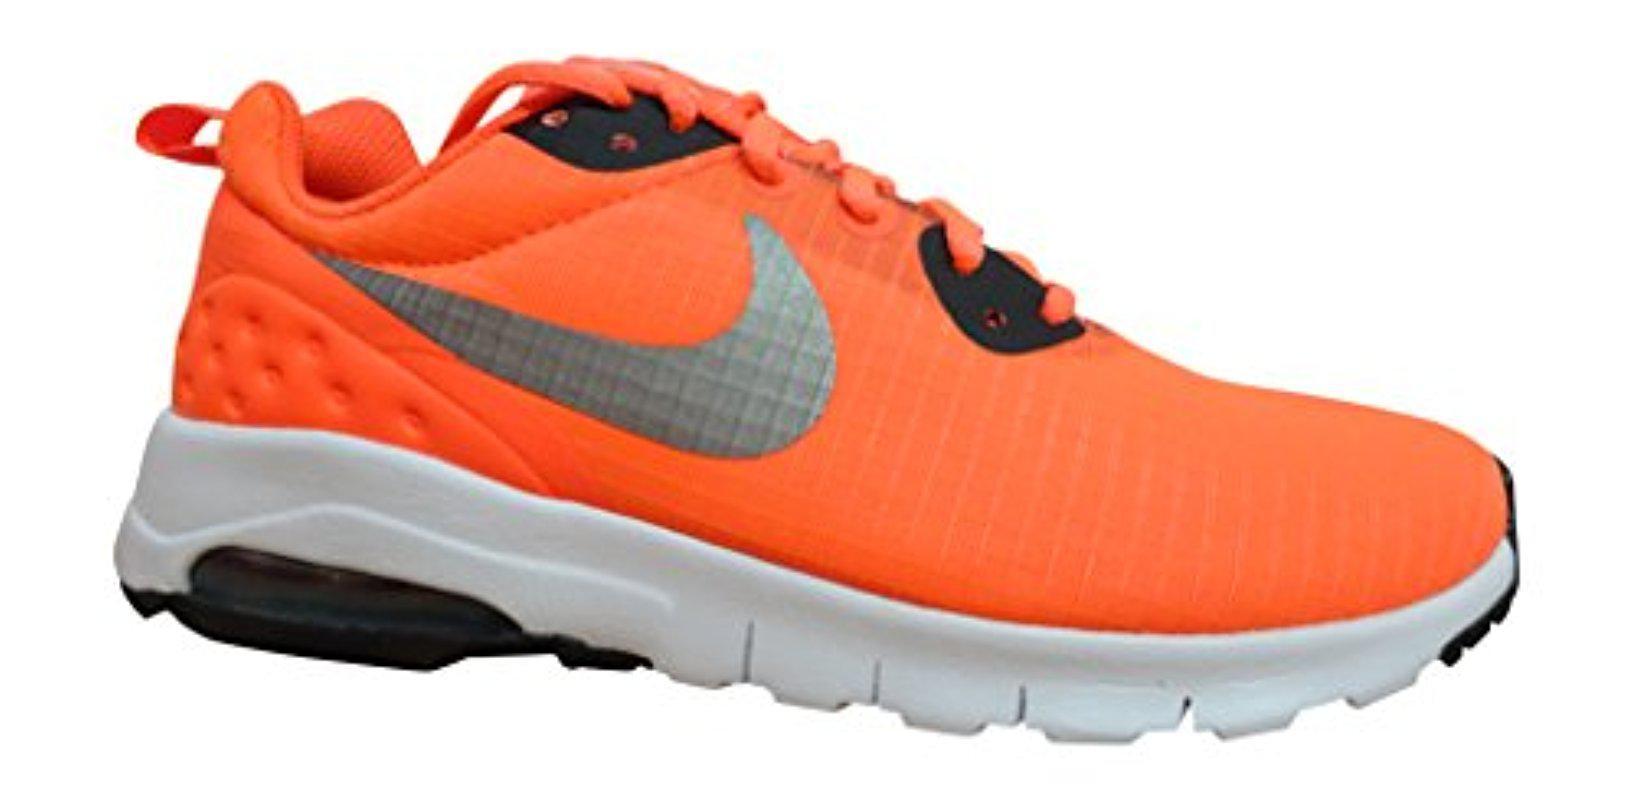 online retailer d87ce 06f38 Nike. Womens Orange Air Max Motion ...